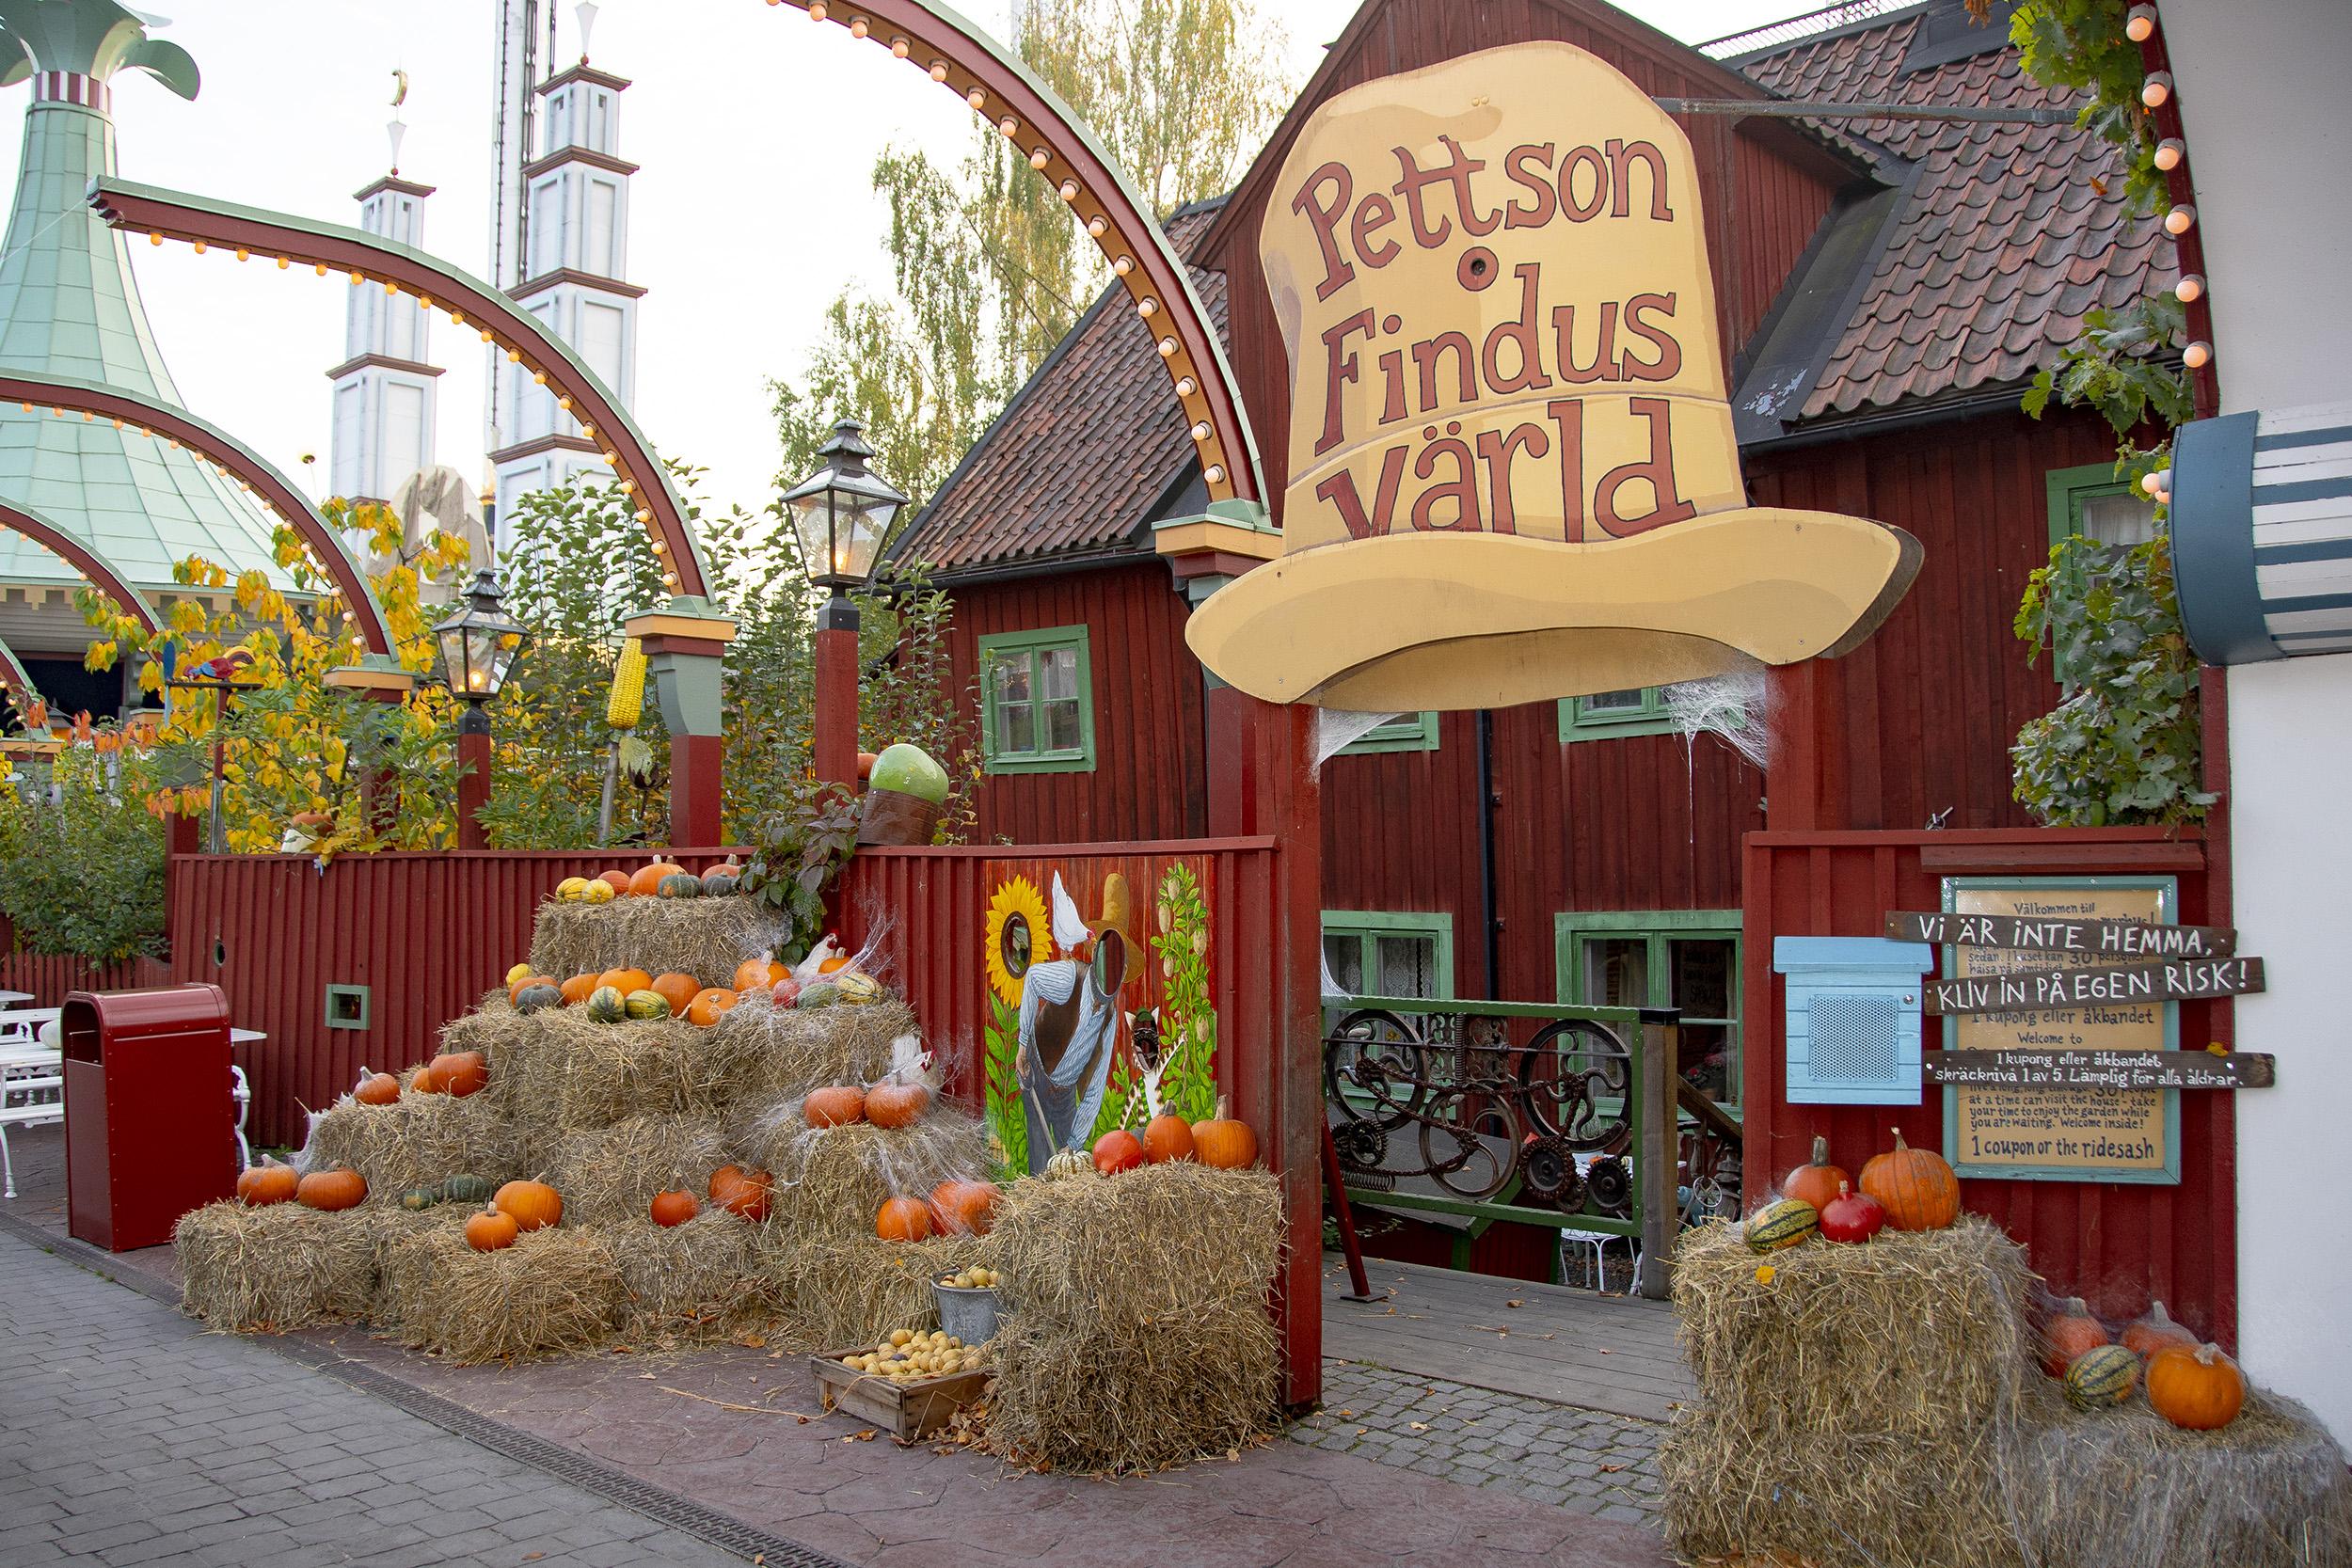 Halloween på Gröna Lund, Pettson o Findus spökhus